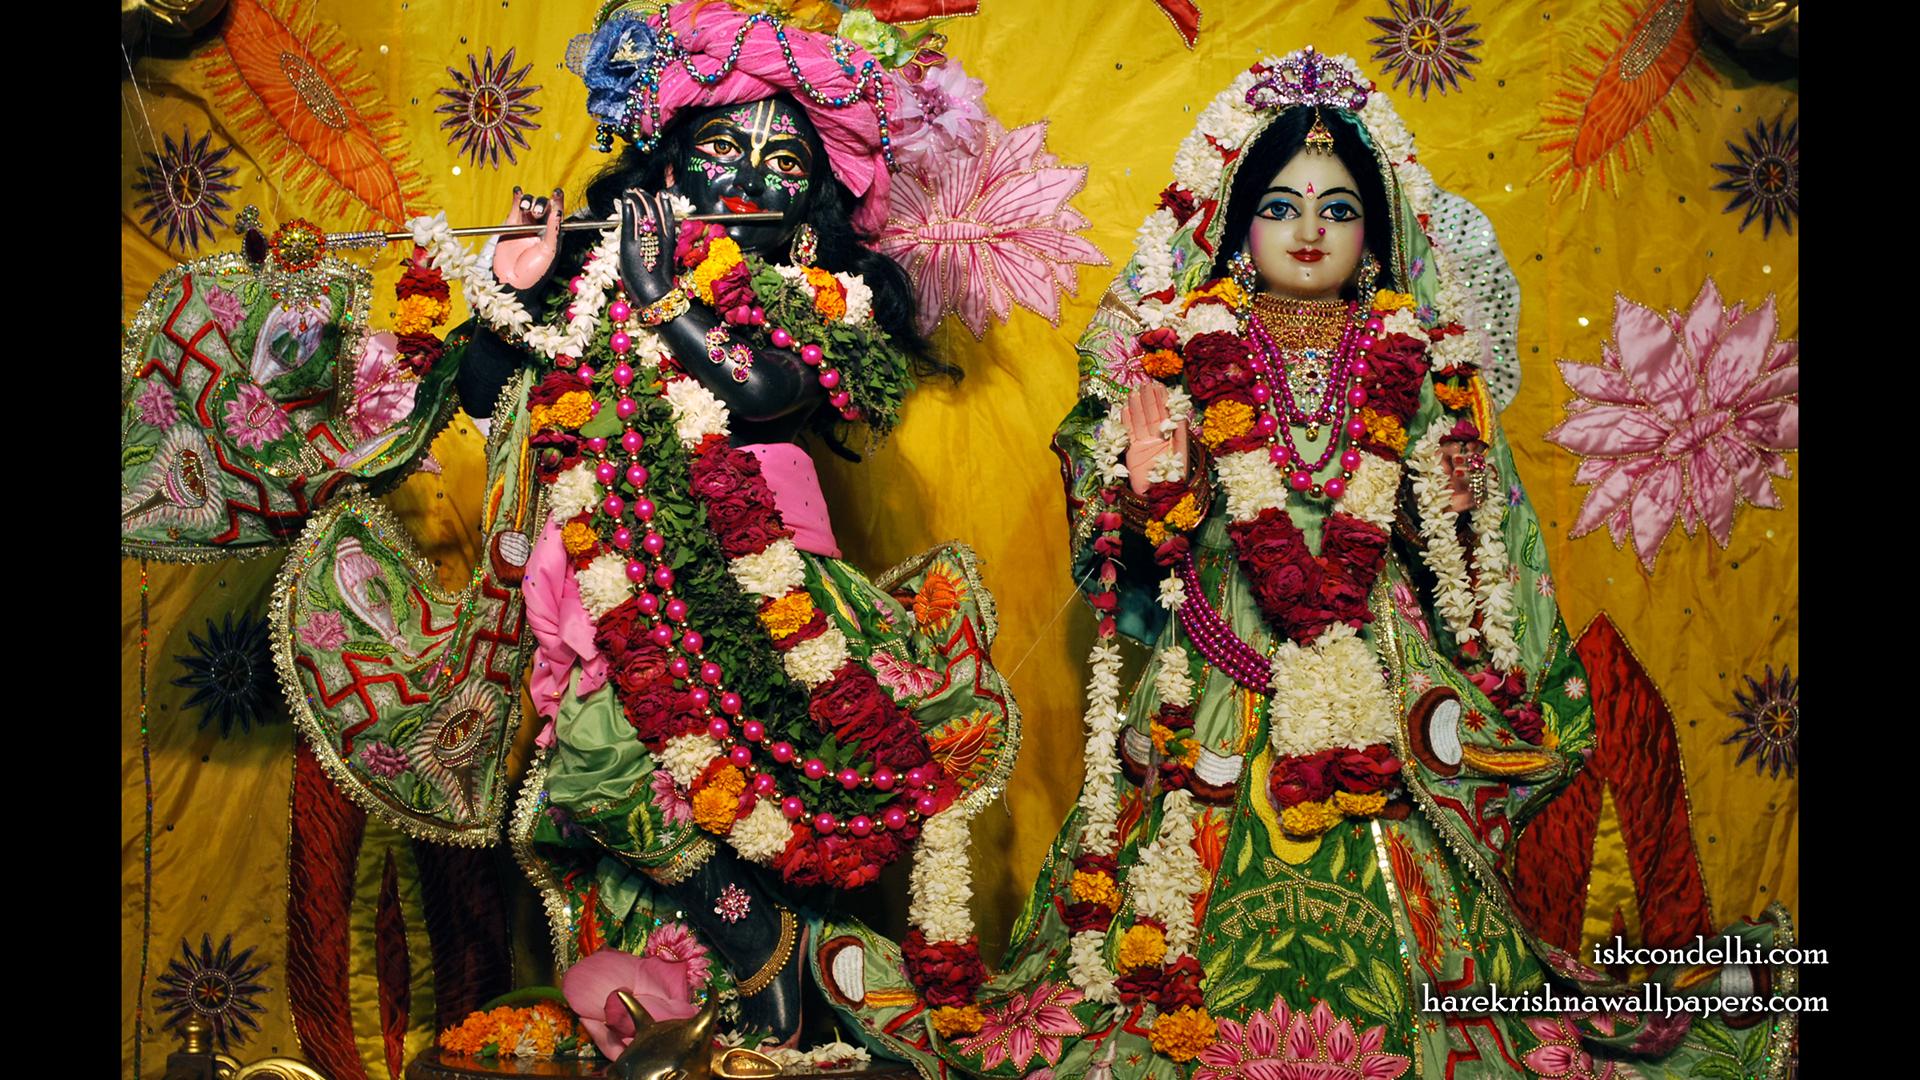 Sri Sri Radha Parthasarathi Wallpaper (003) Size 1920x1080 Download